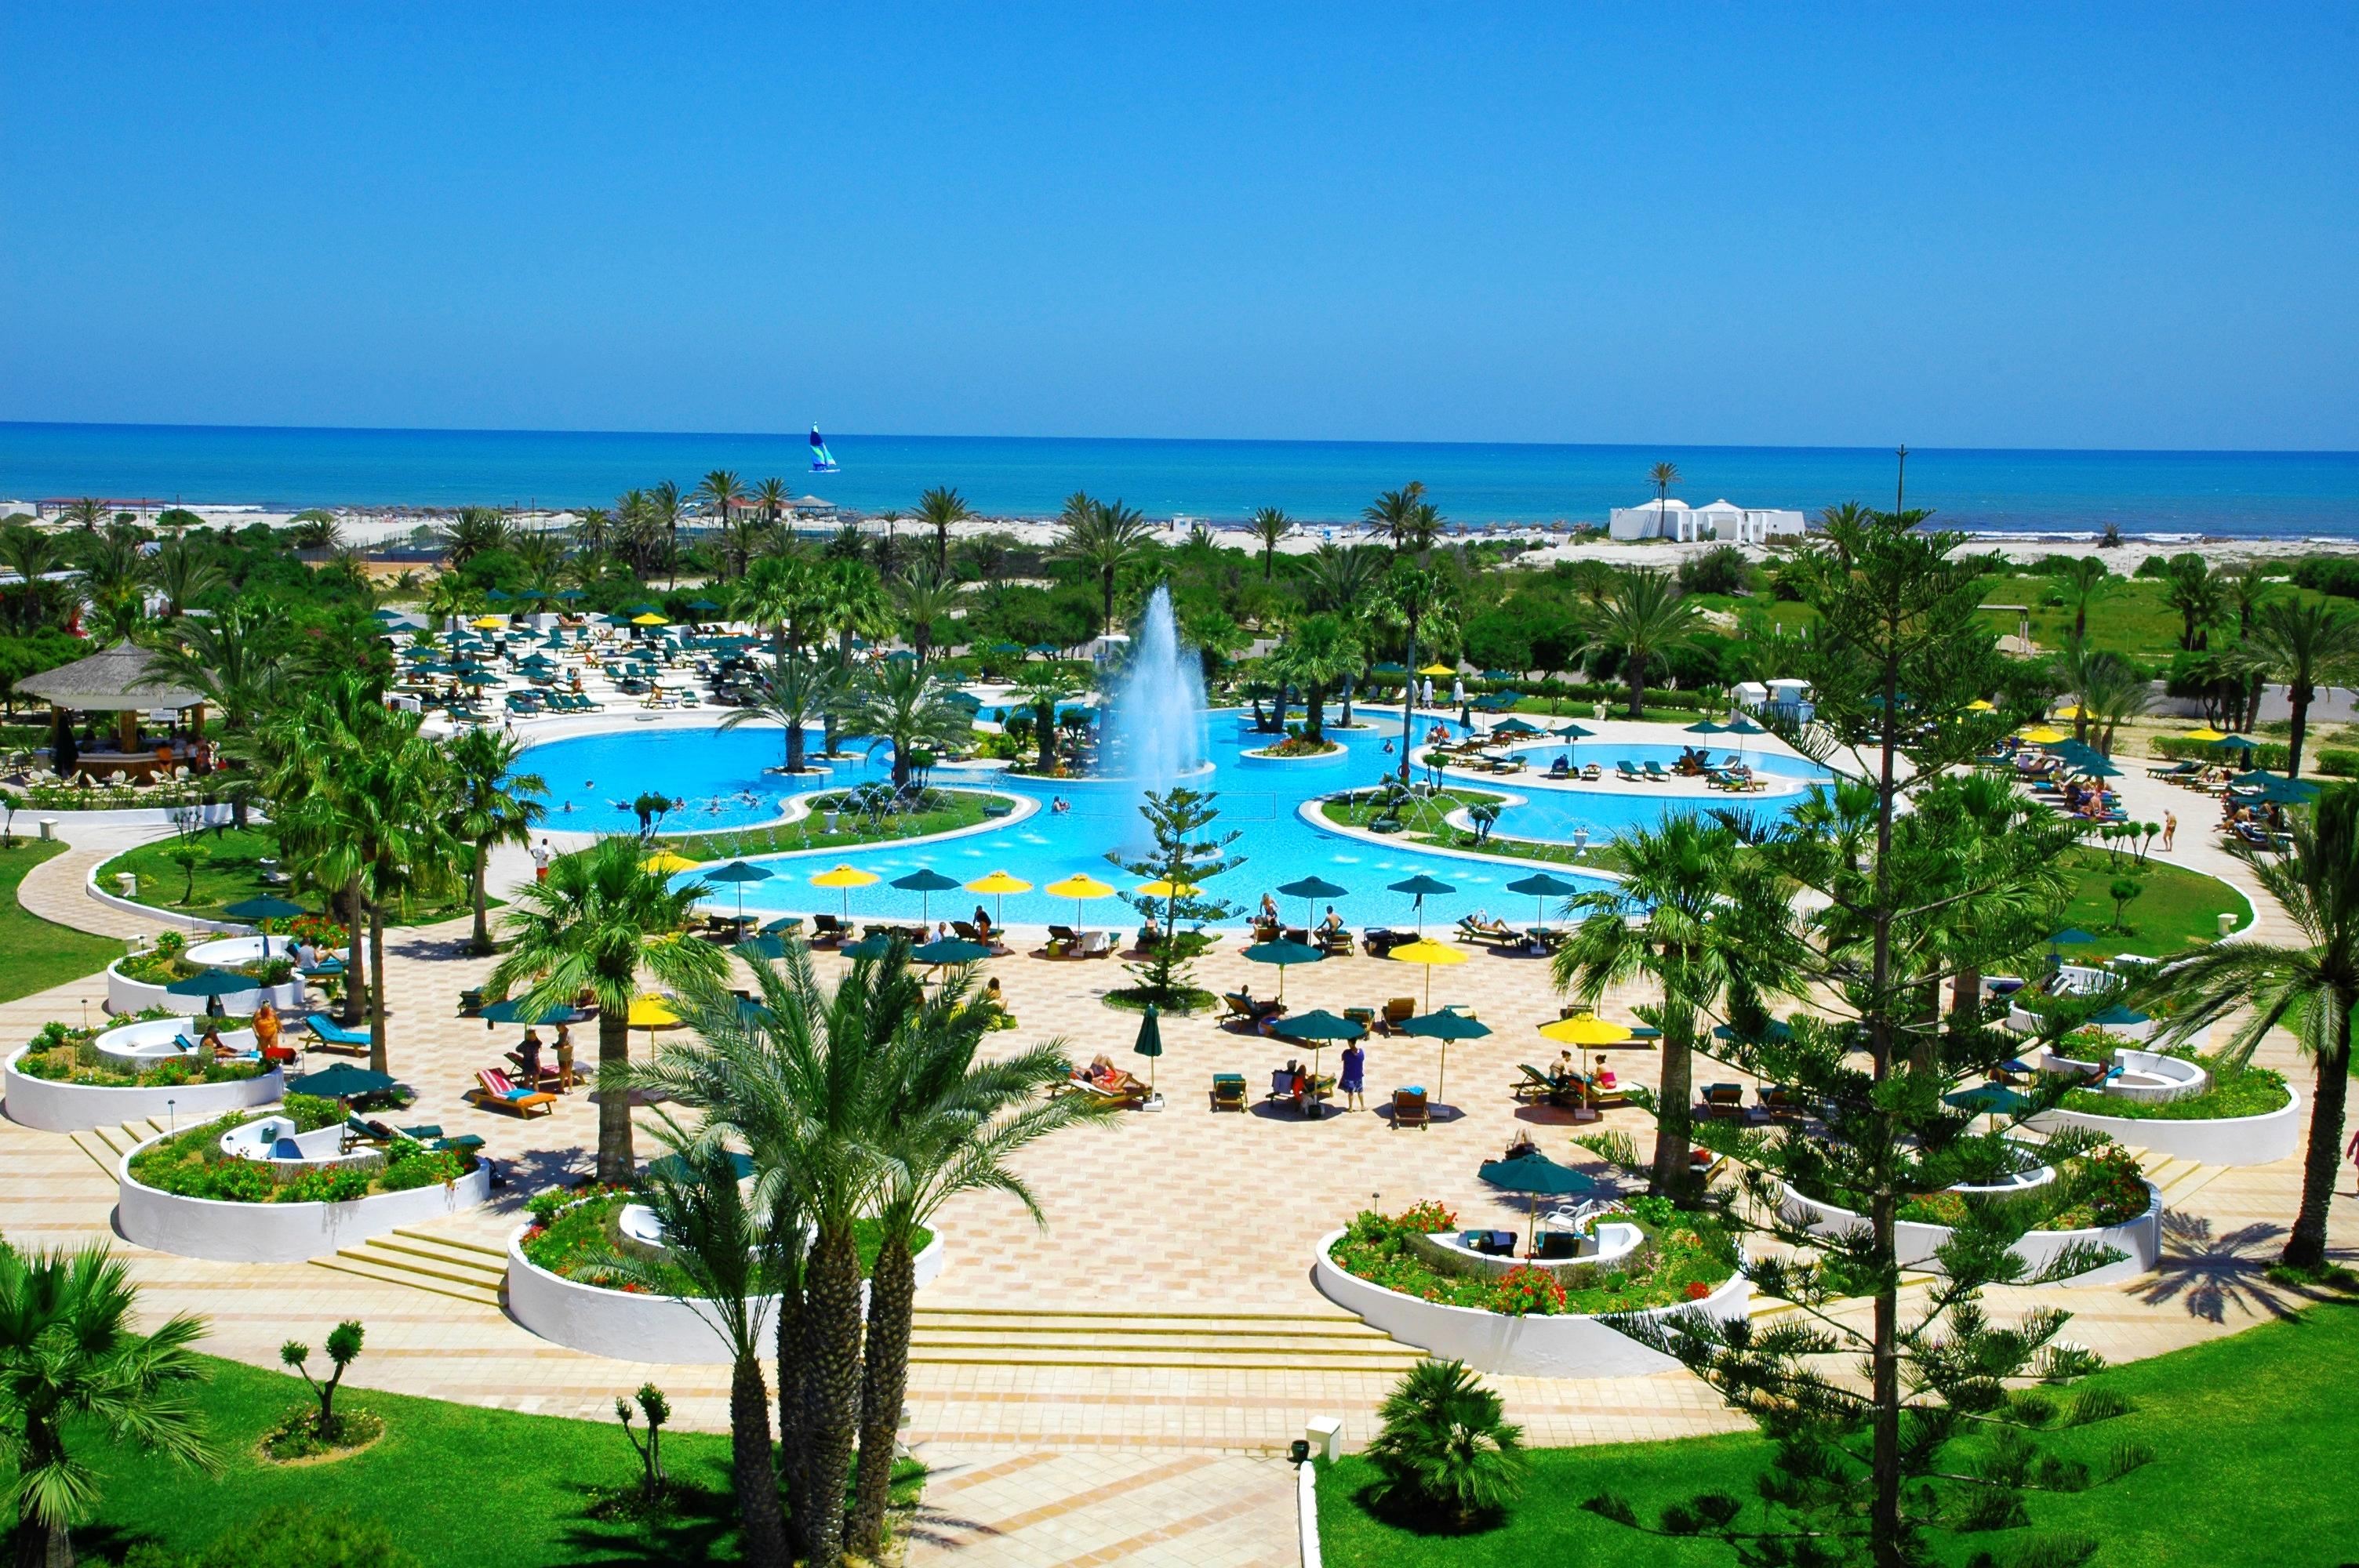 Djerba plaza piscine exterieur8f8f